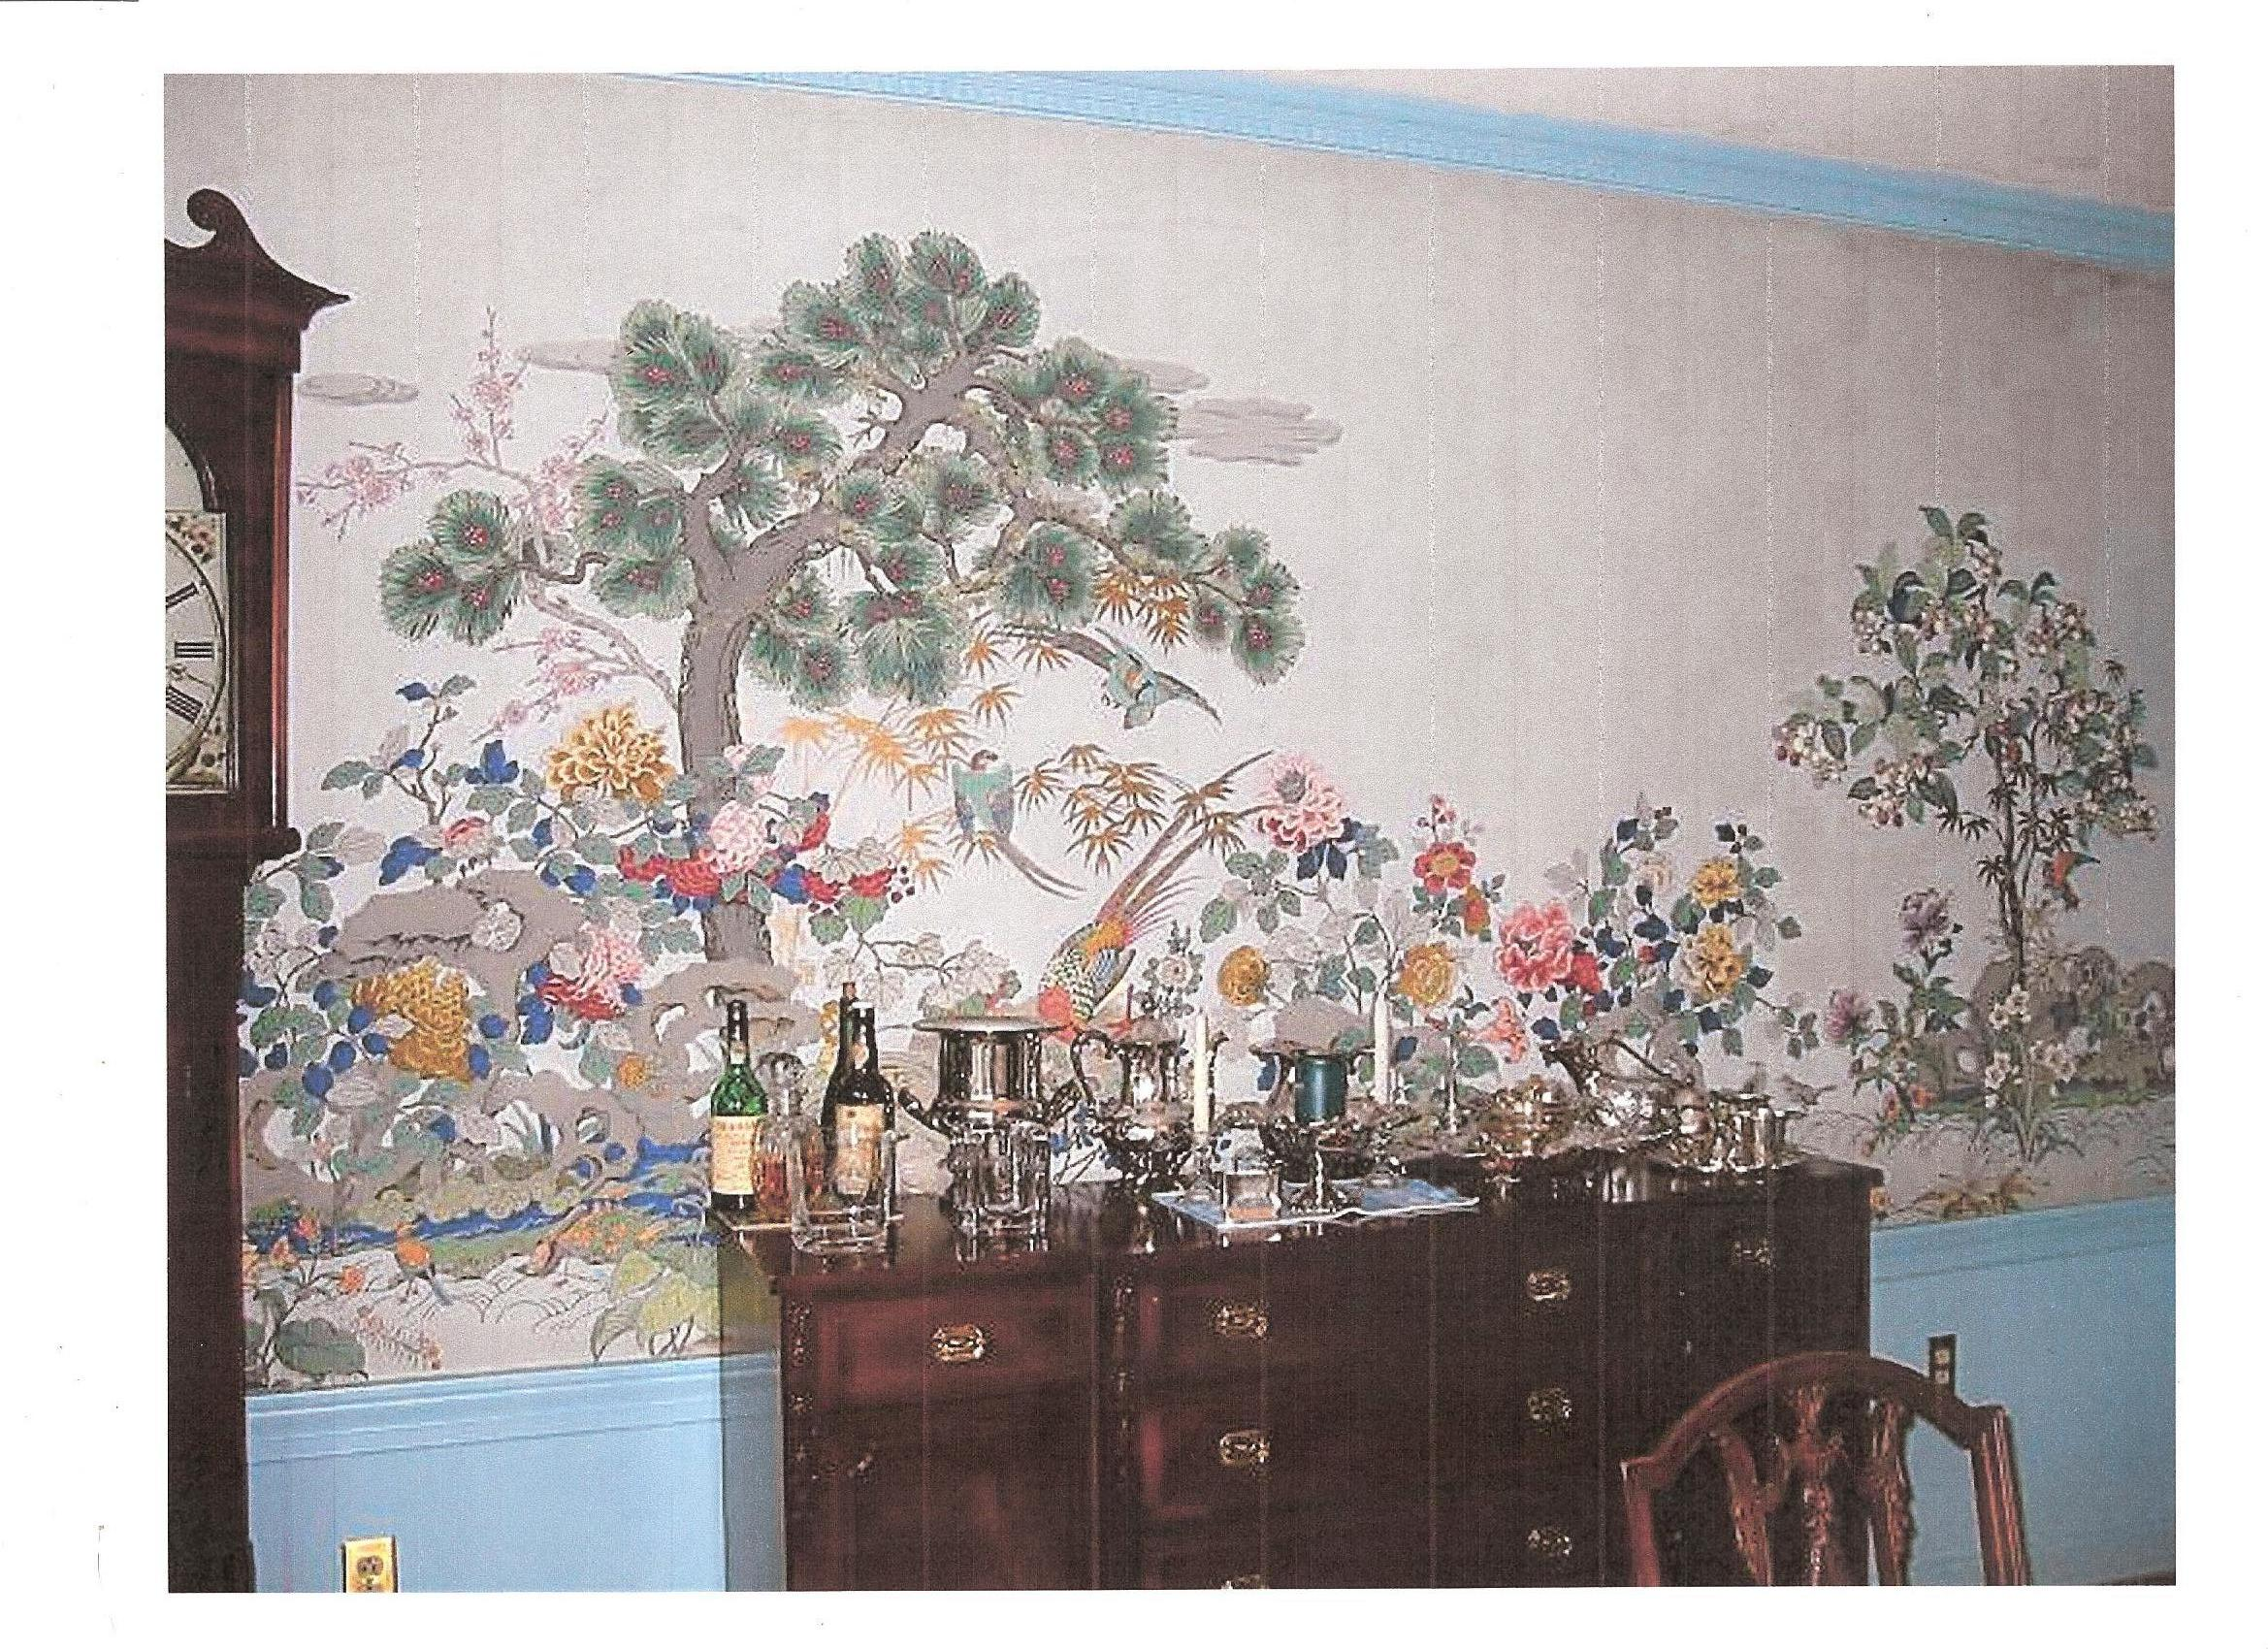 De Gournay Wallpaper Costs Images TheCelebrityPix 2338x1700